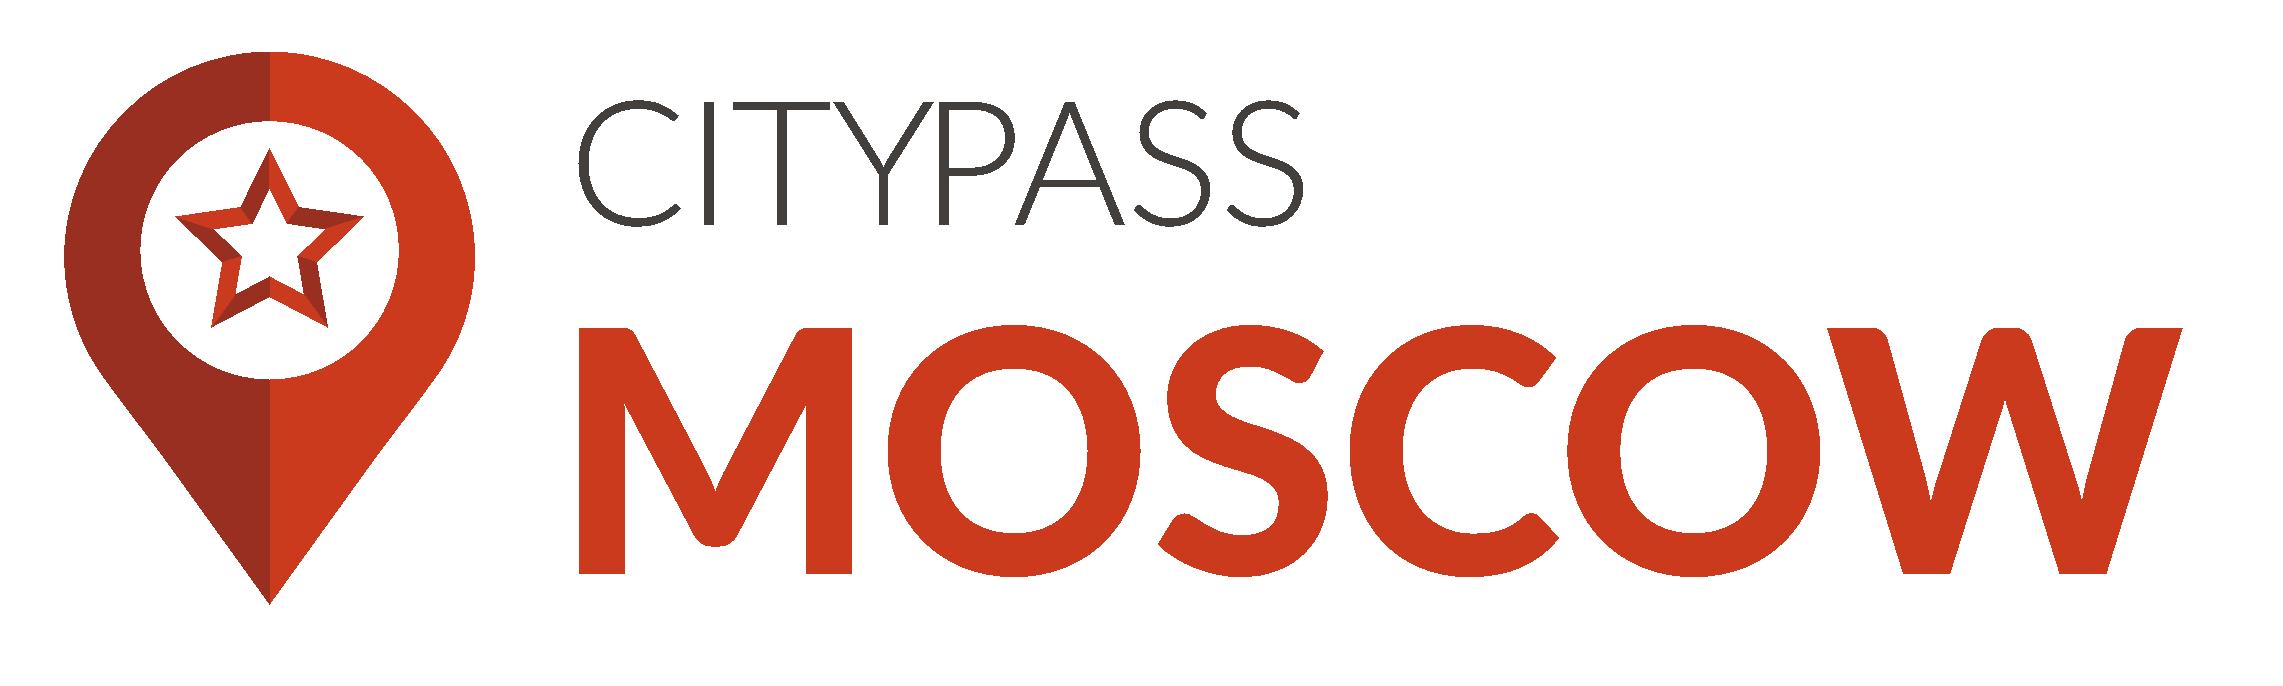 CityPass Mosca Dettagli